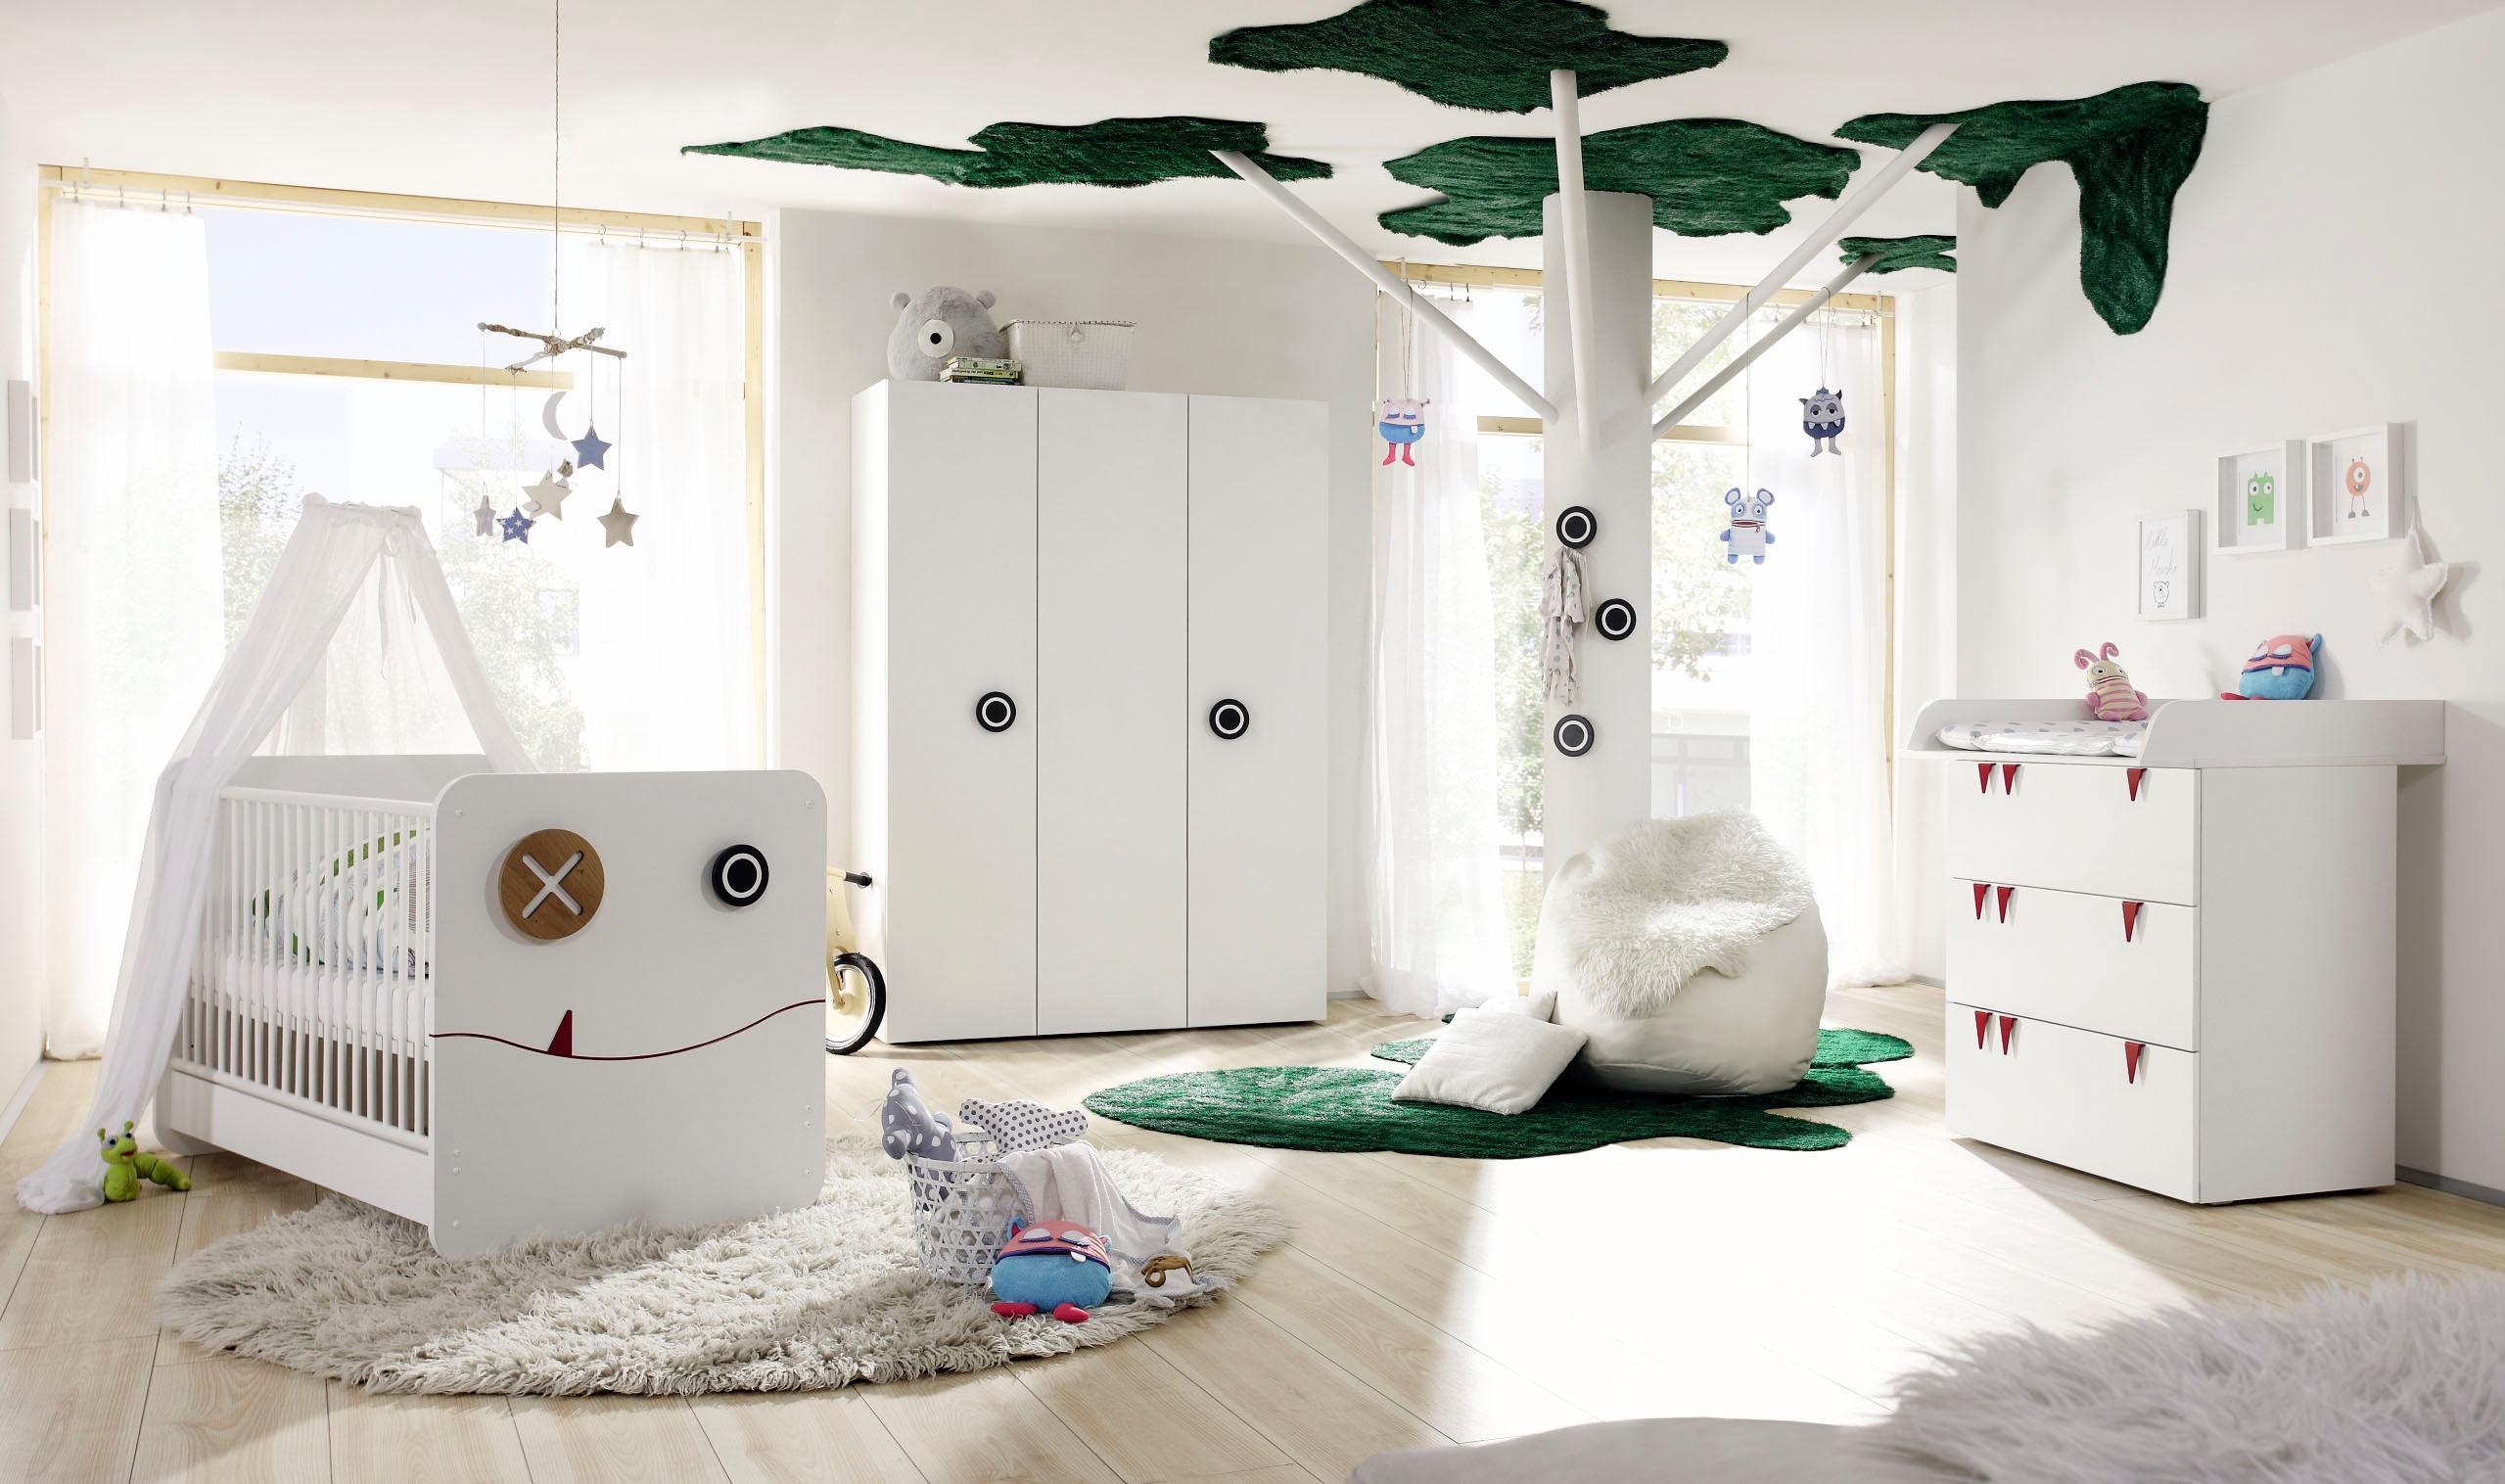 now! by hülsta Babyzimmer-Komplettset now! minimo (Set 5-tlg) | Kinderzimmer > Babymöbel > Komplett-Babyzimmer | Weiß | Now! By Hülsta